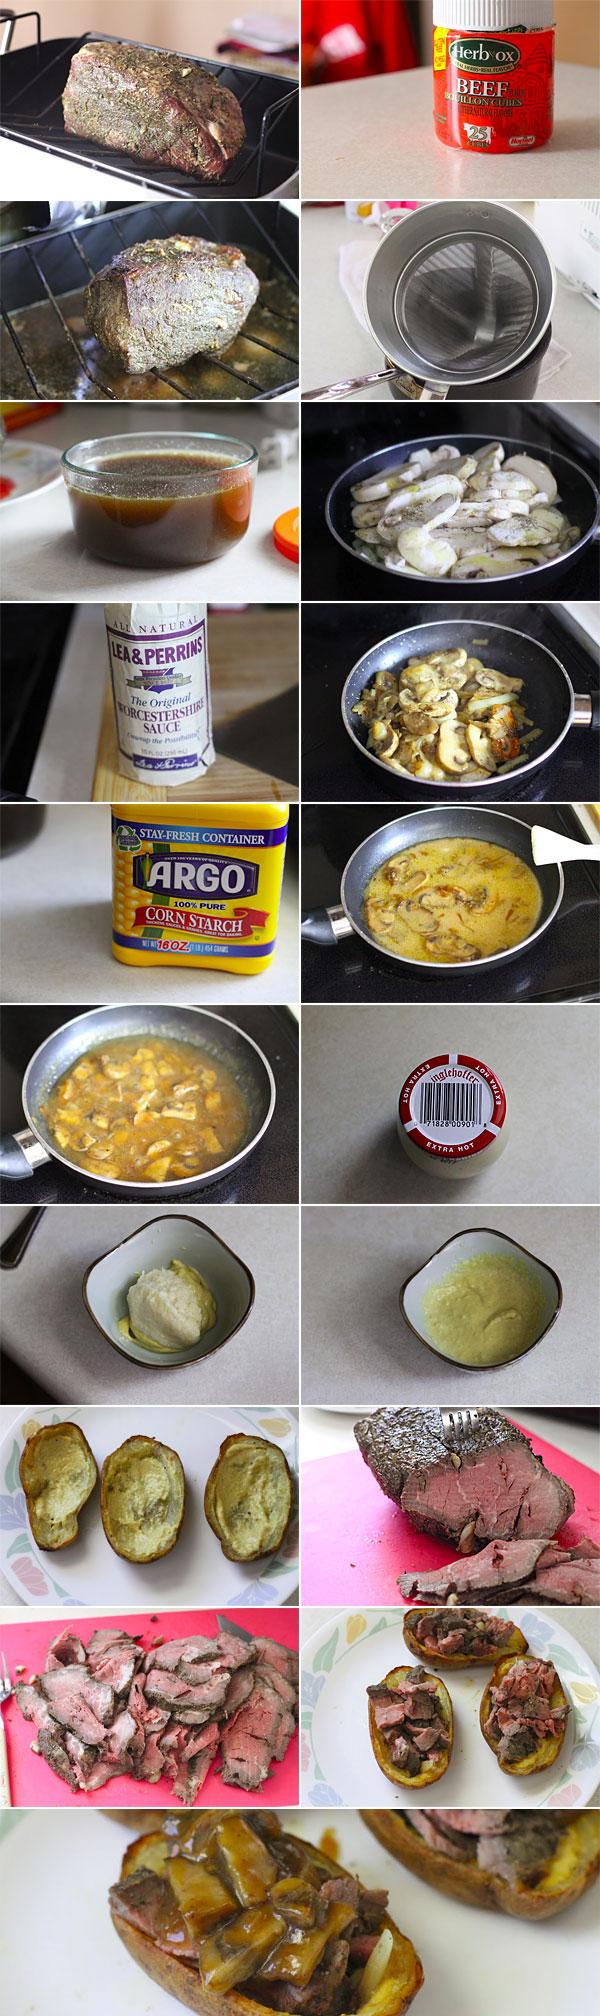 How to make potato skins recipe